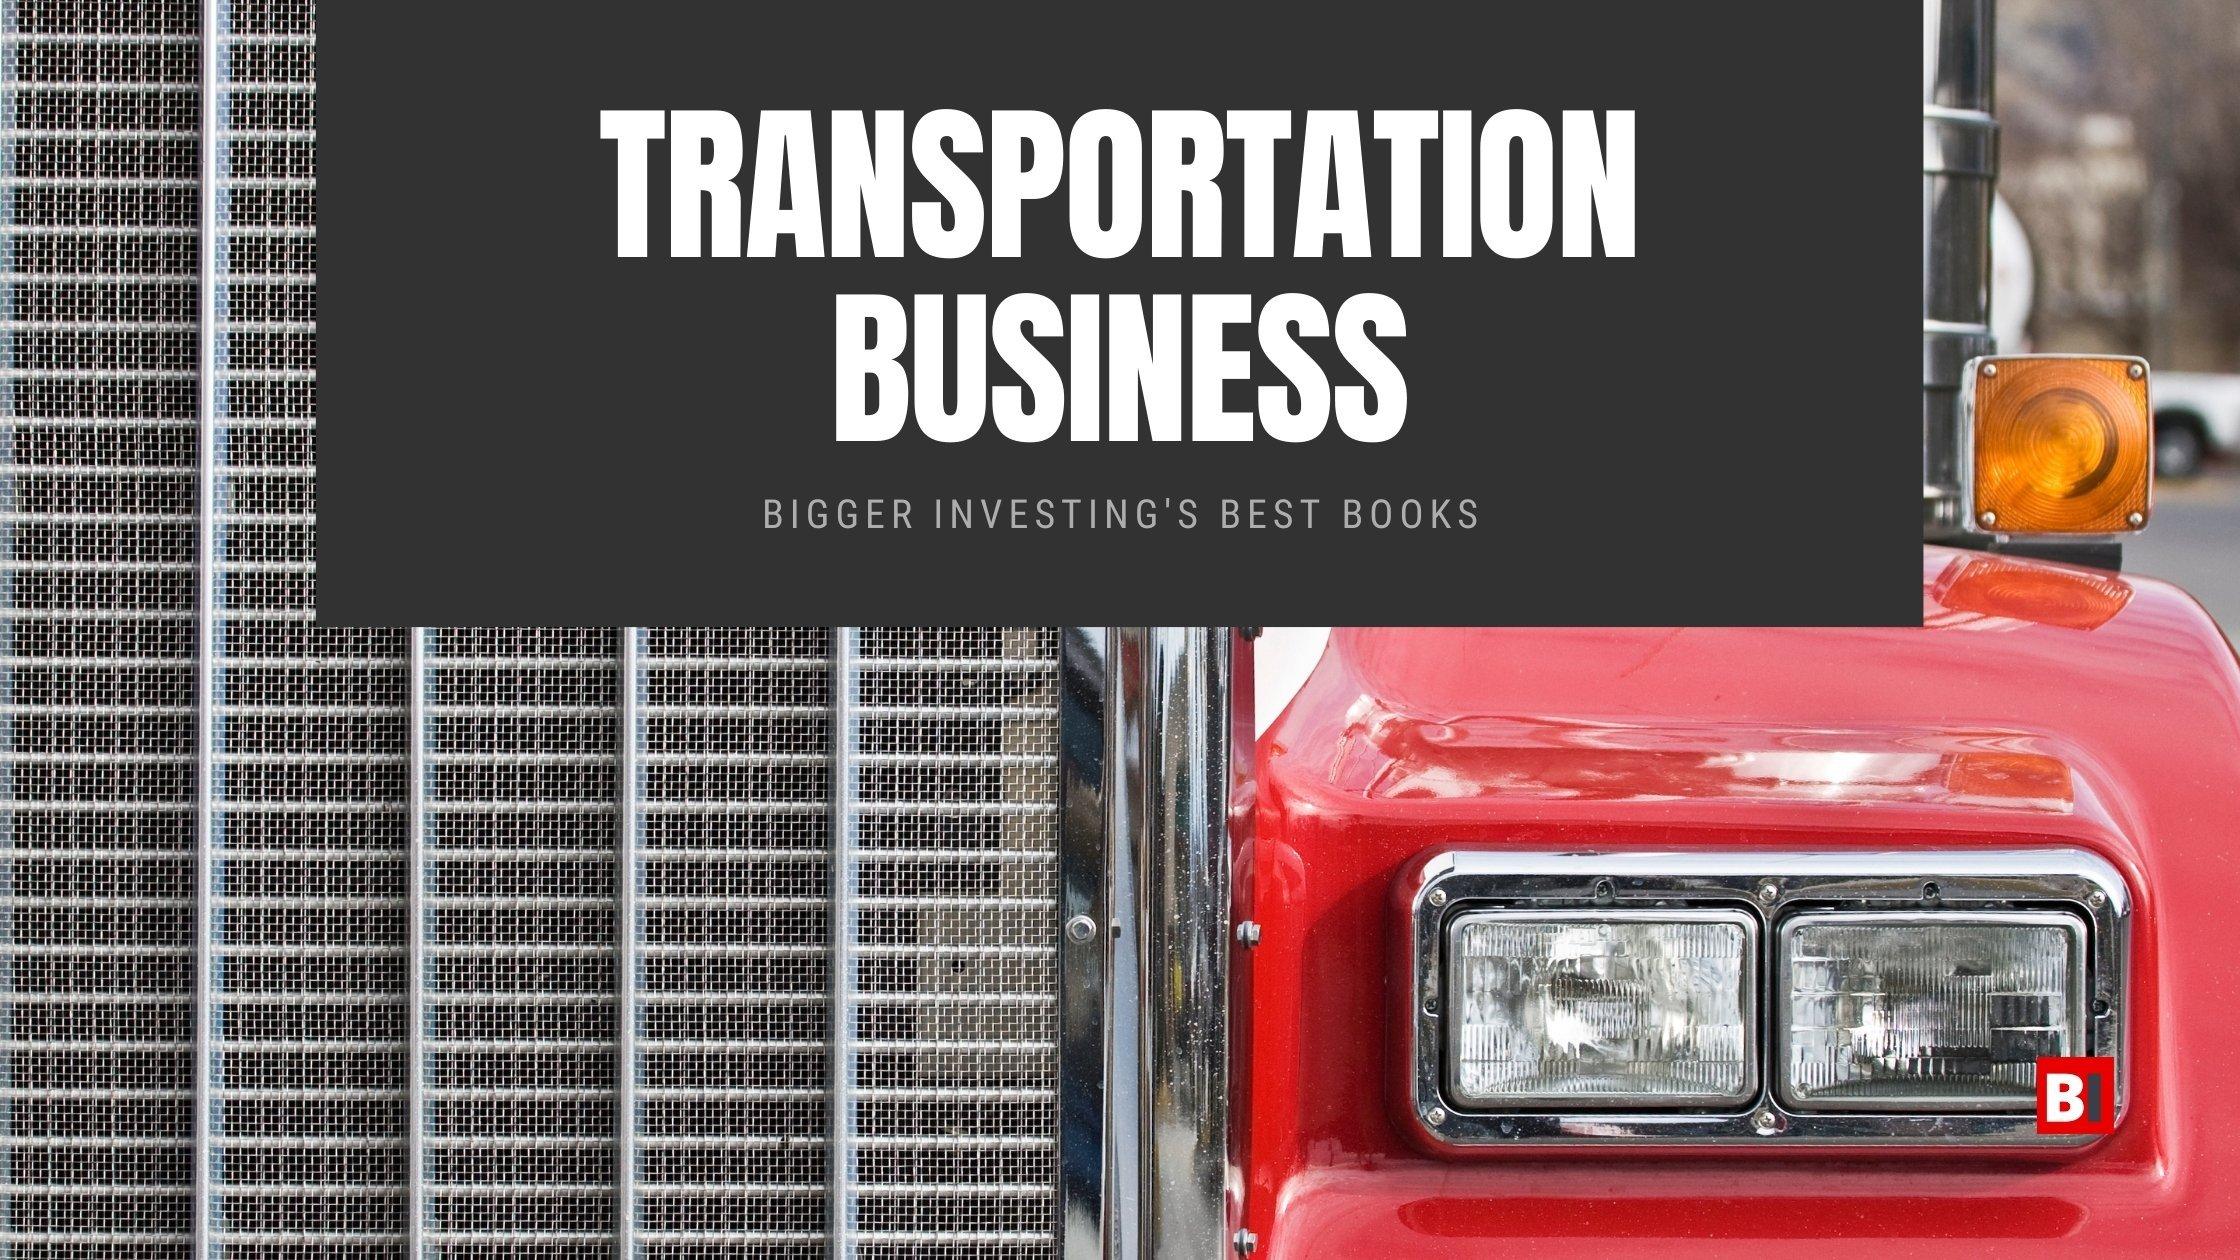 Best Books on Transportation Business